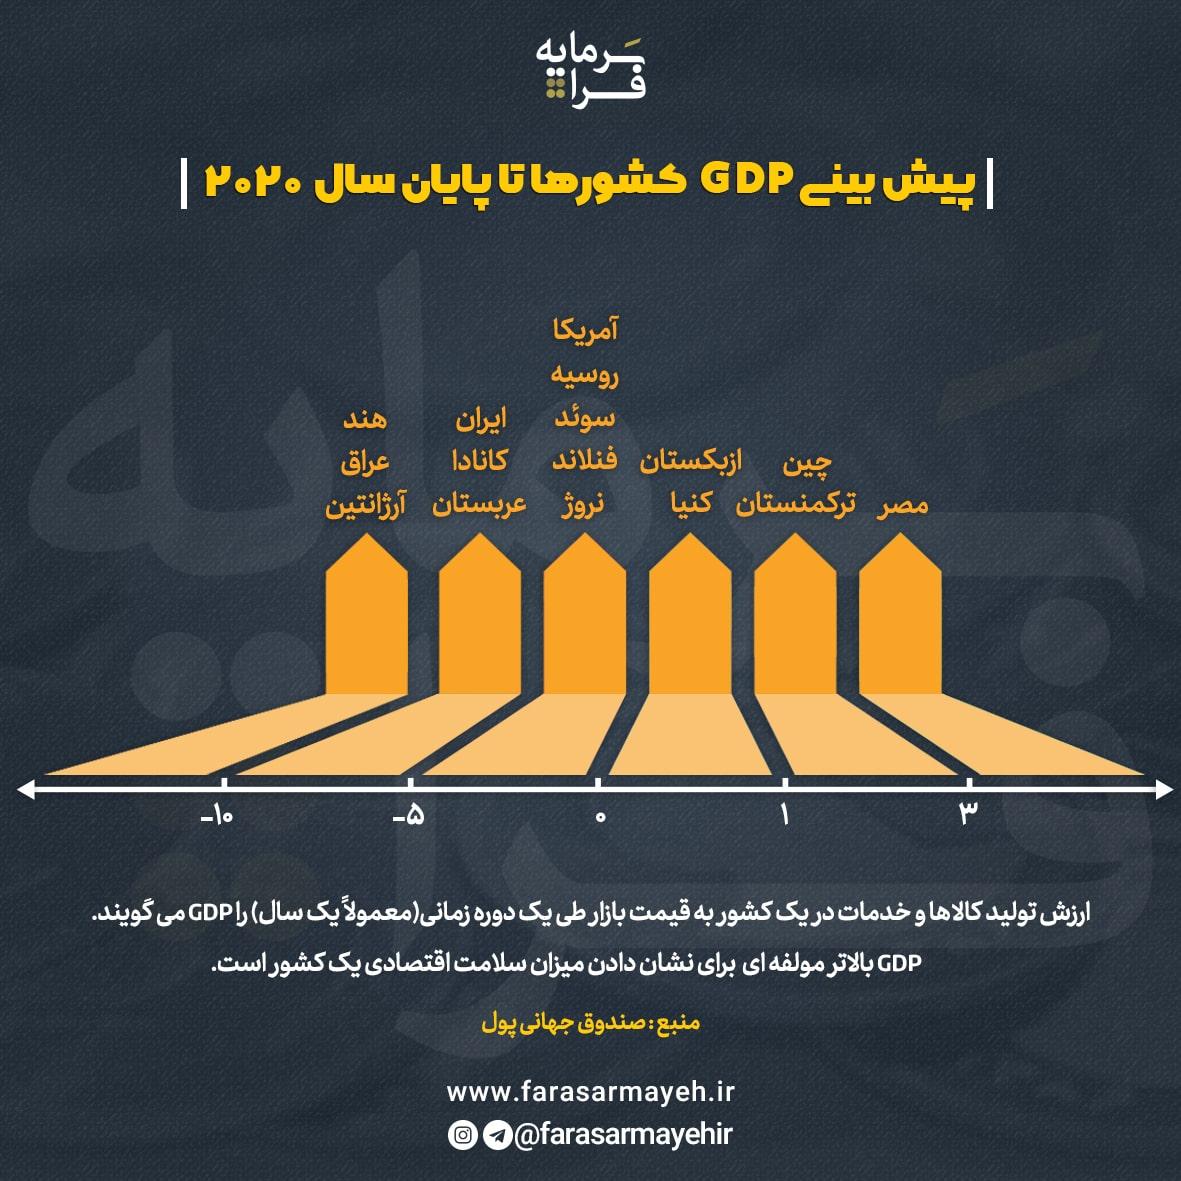 پیشبینی GDP کشورها تا پایان سال 2020